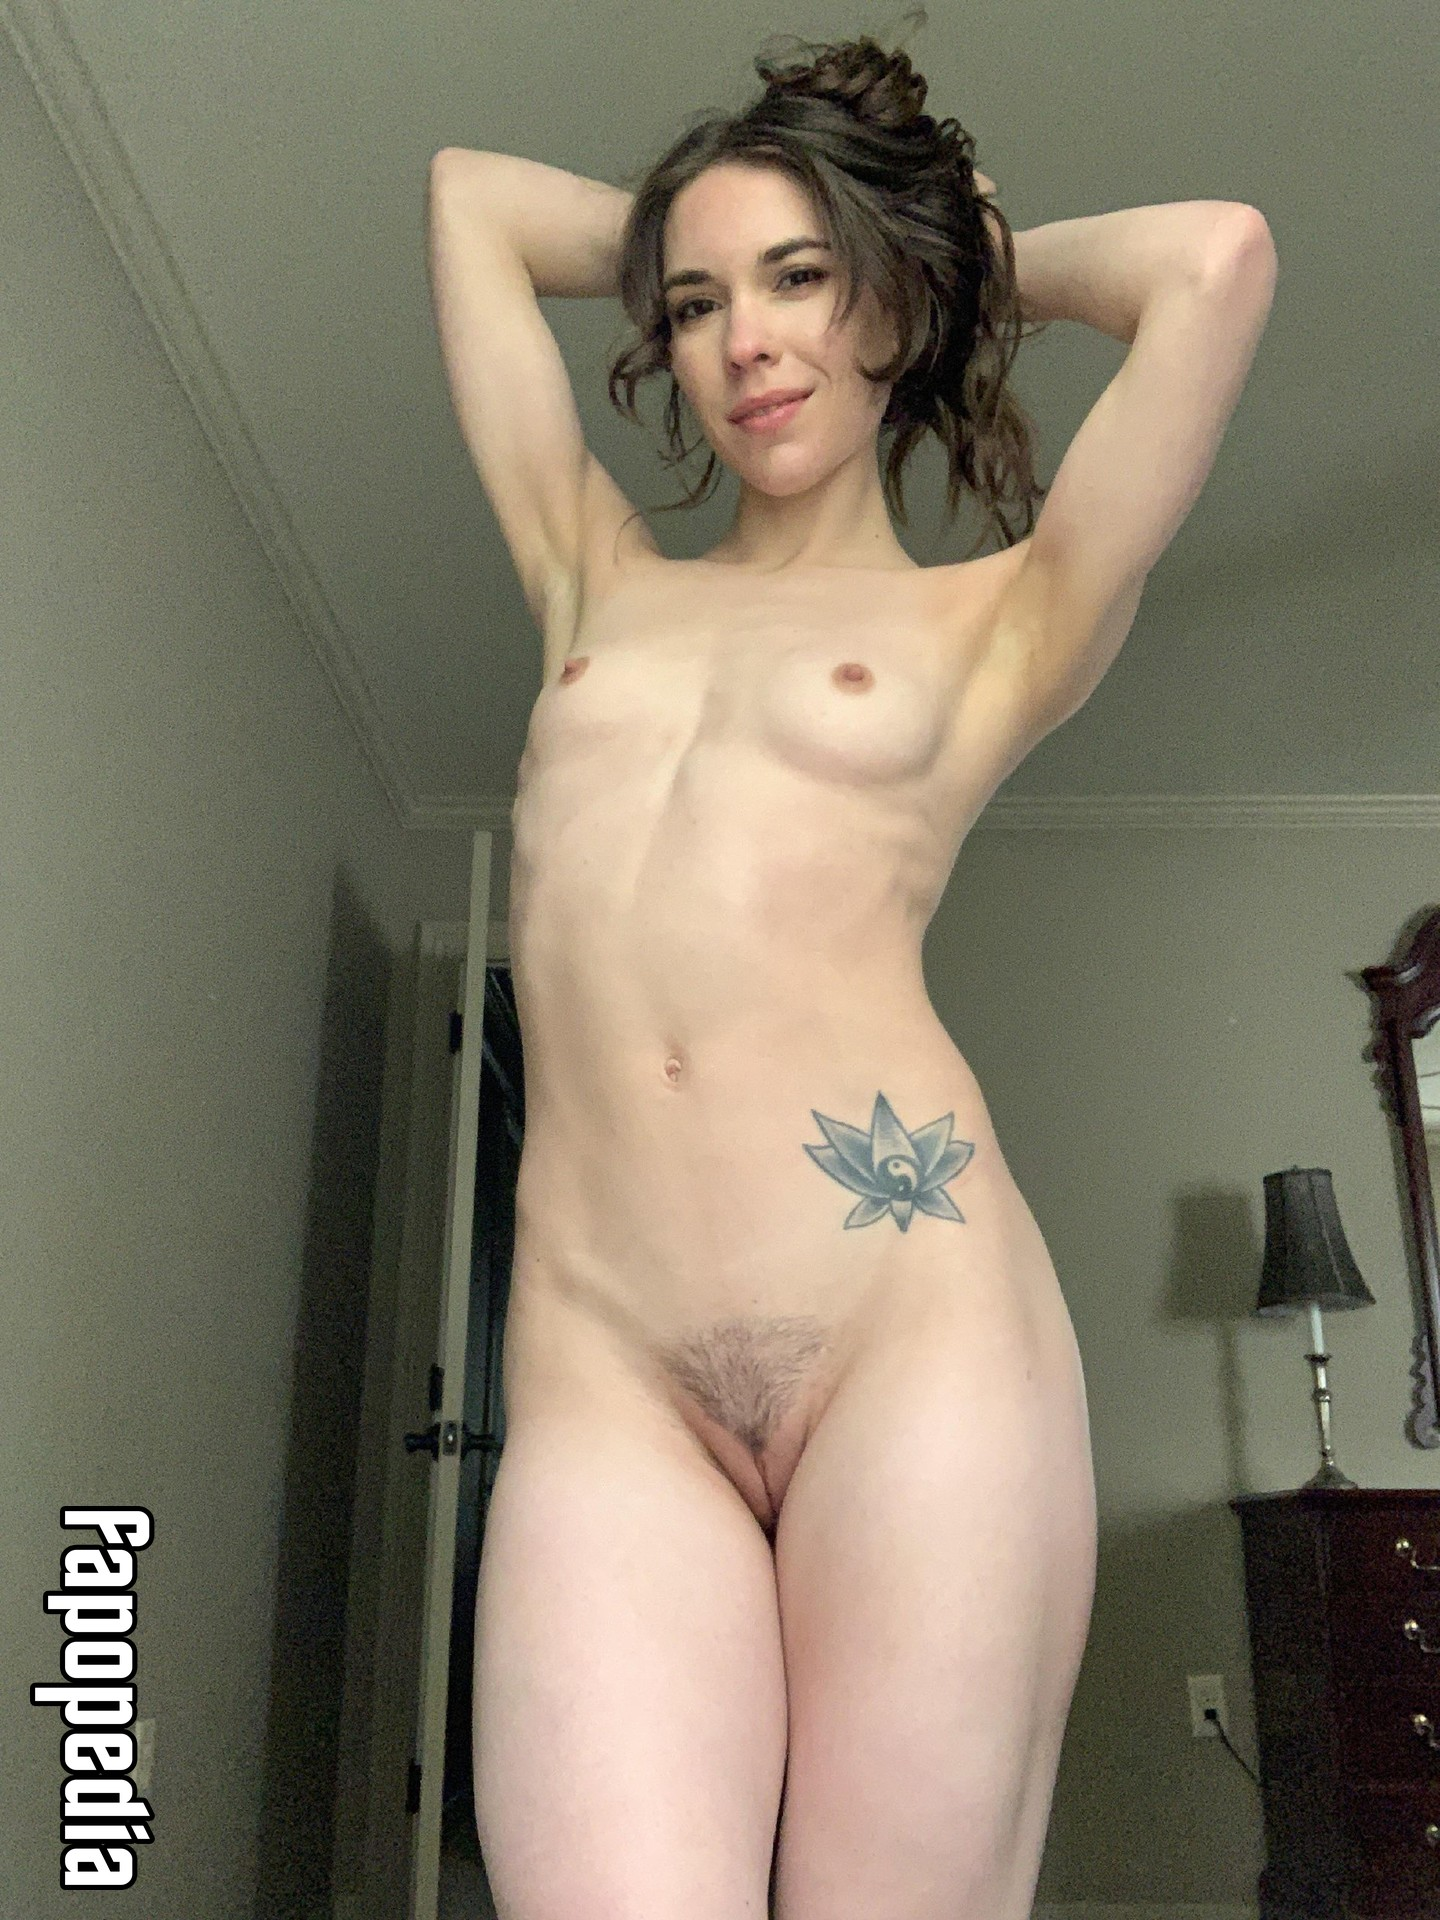 Sonia_Sparrow Nude Leaks